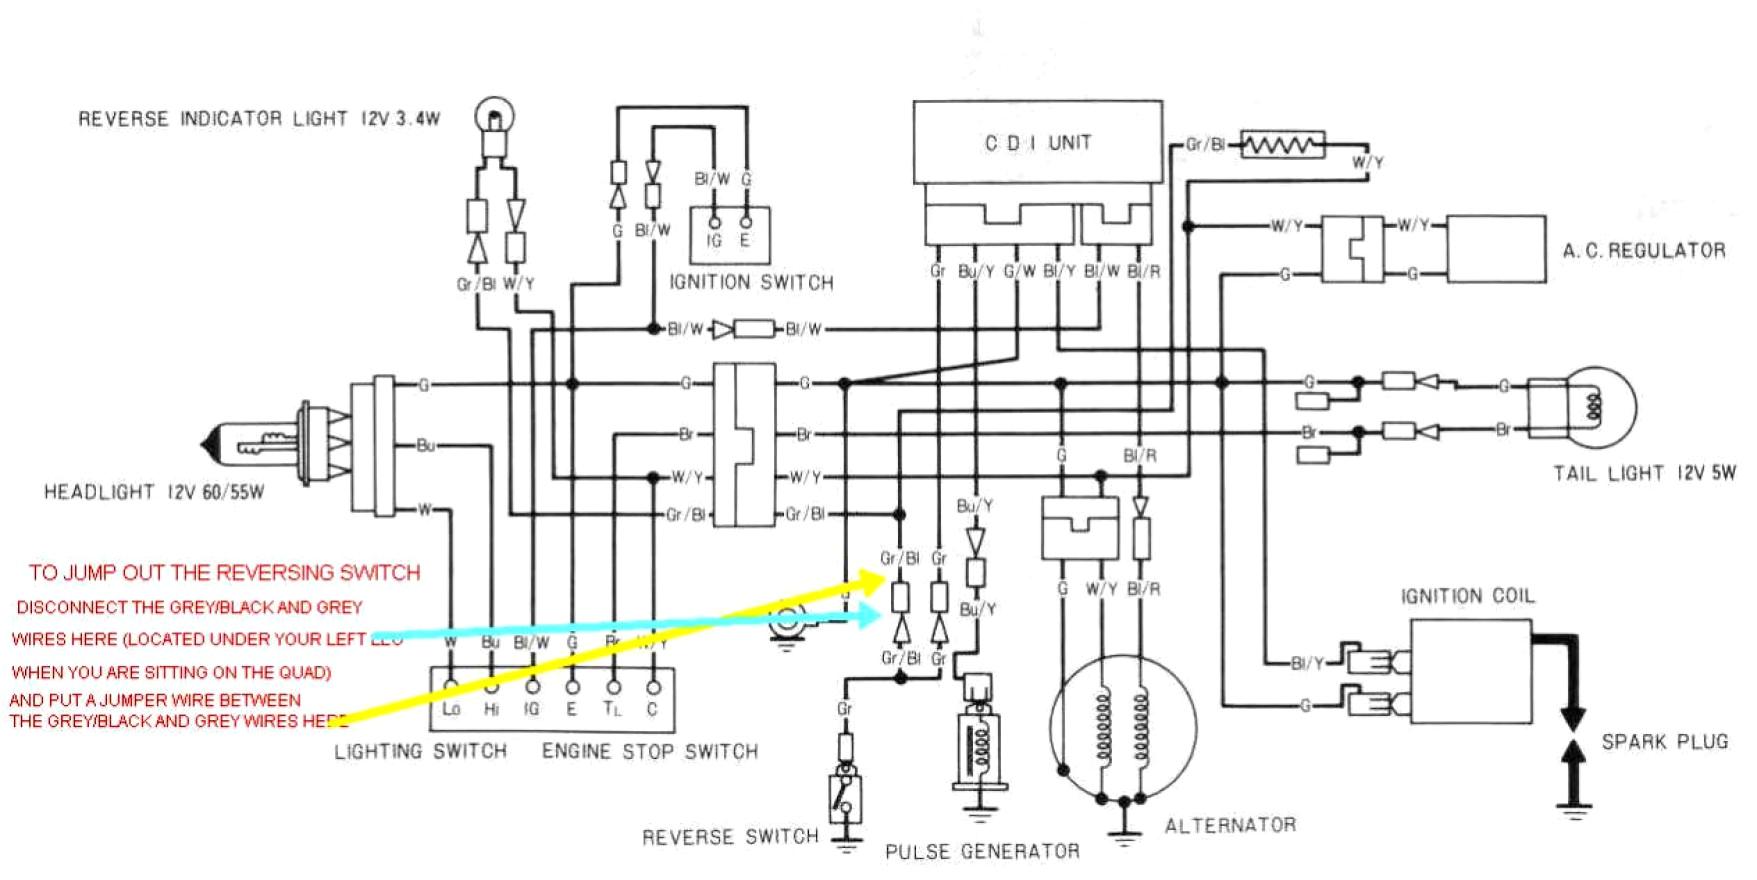 wire diagram 2001 honda rancher wiring diagram featuredfourtrax 300 wiring diagram also honda rancher 350 wiring